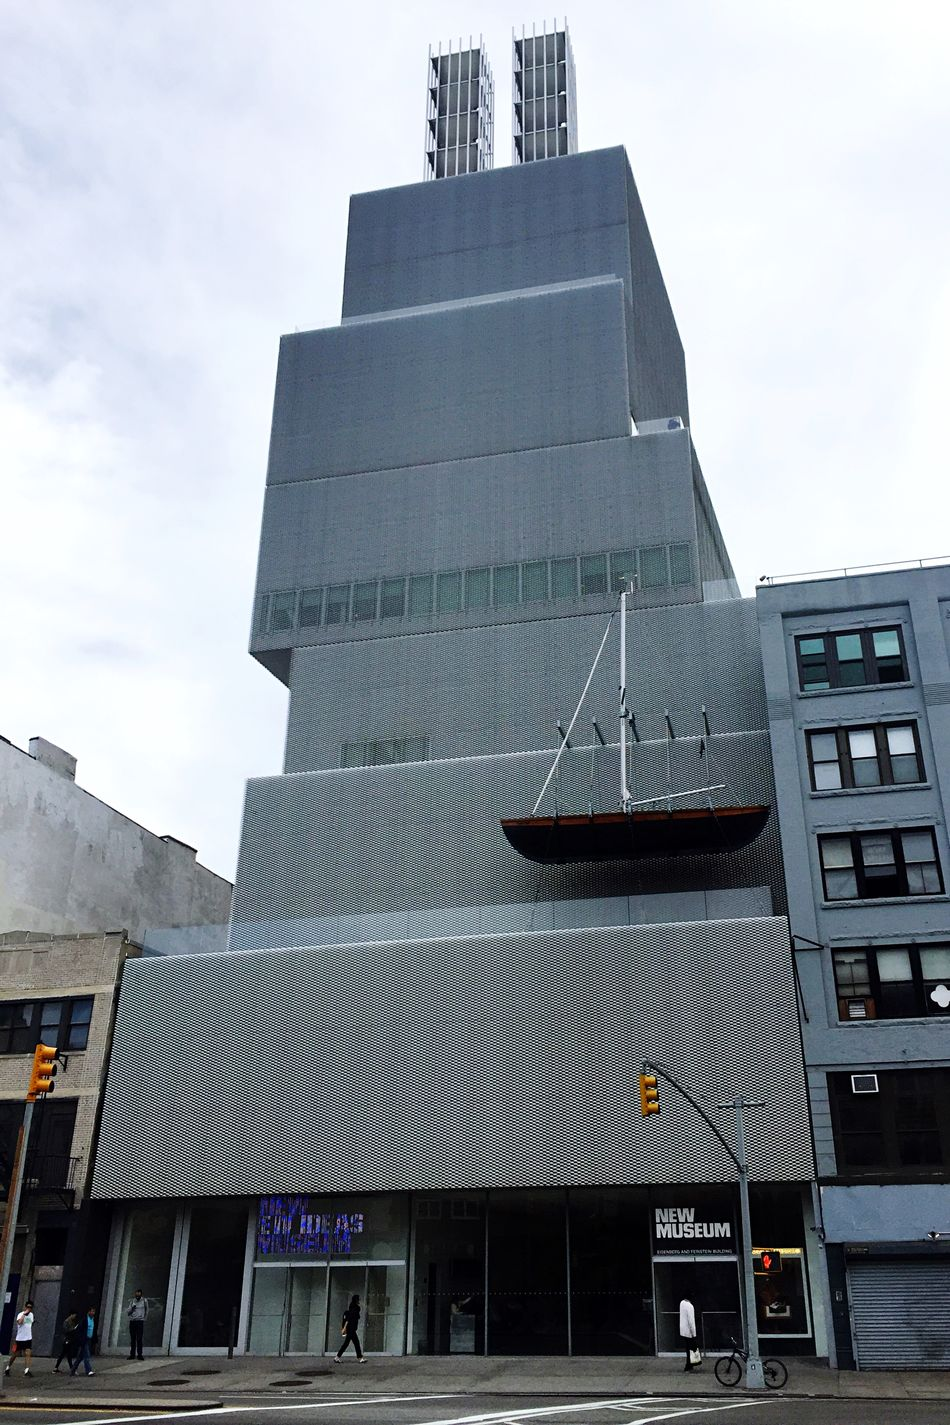 New Museum Of Contemporary Art KazuyoSejima RyueNishizawa SANNA Architect Firm 253bowery Newyorkcity